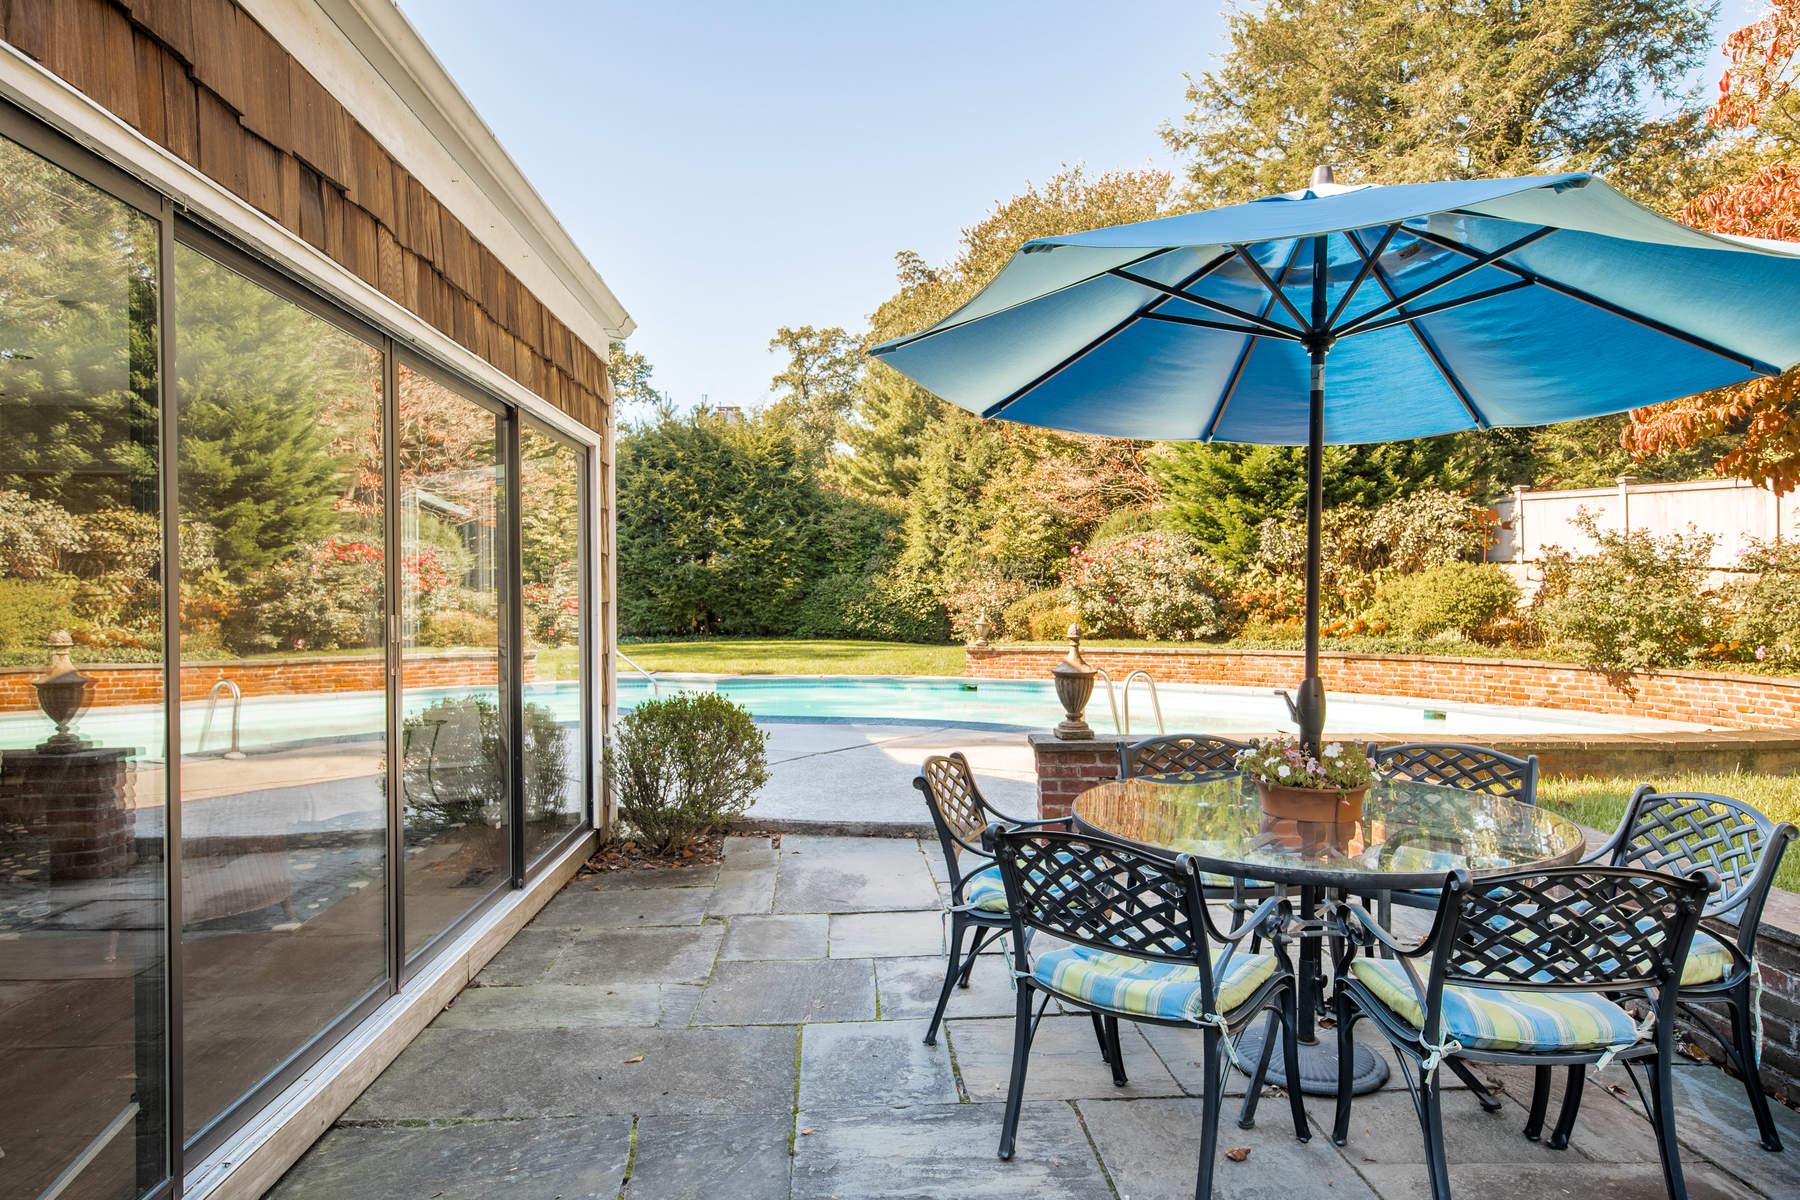 Additional photo for property listing at 35 Hidden Brook Road 35 Hidden Brook Road Riverside, Connecticut 06878 États-Unis